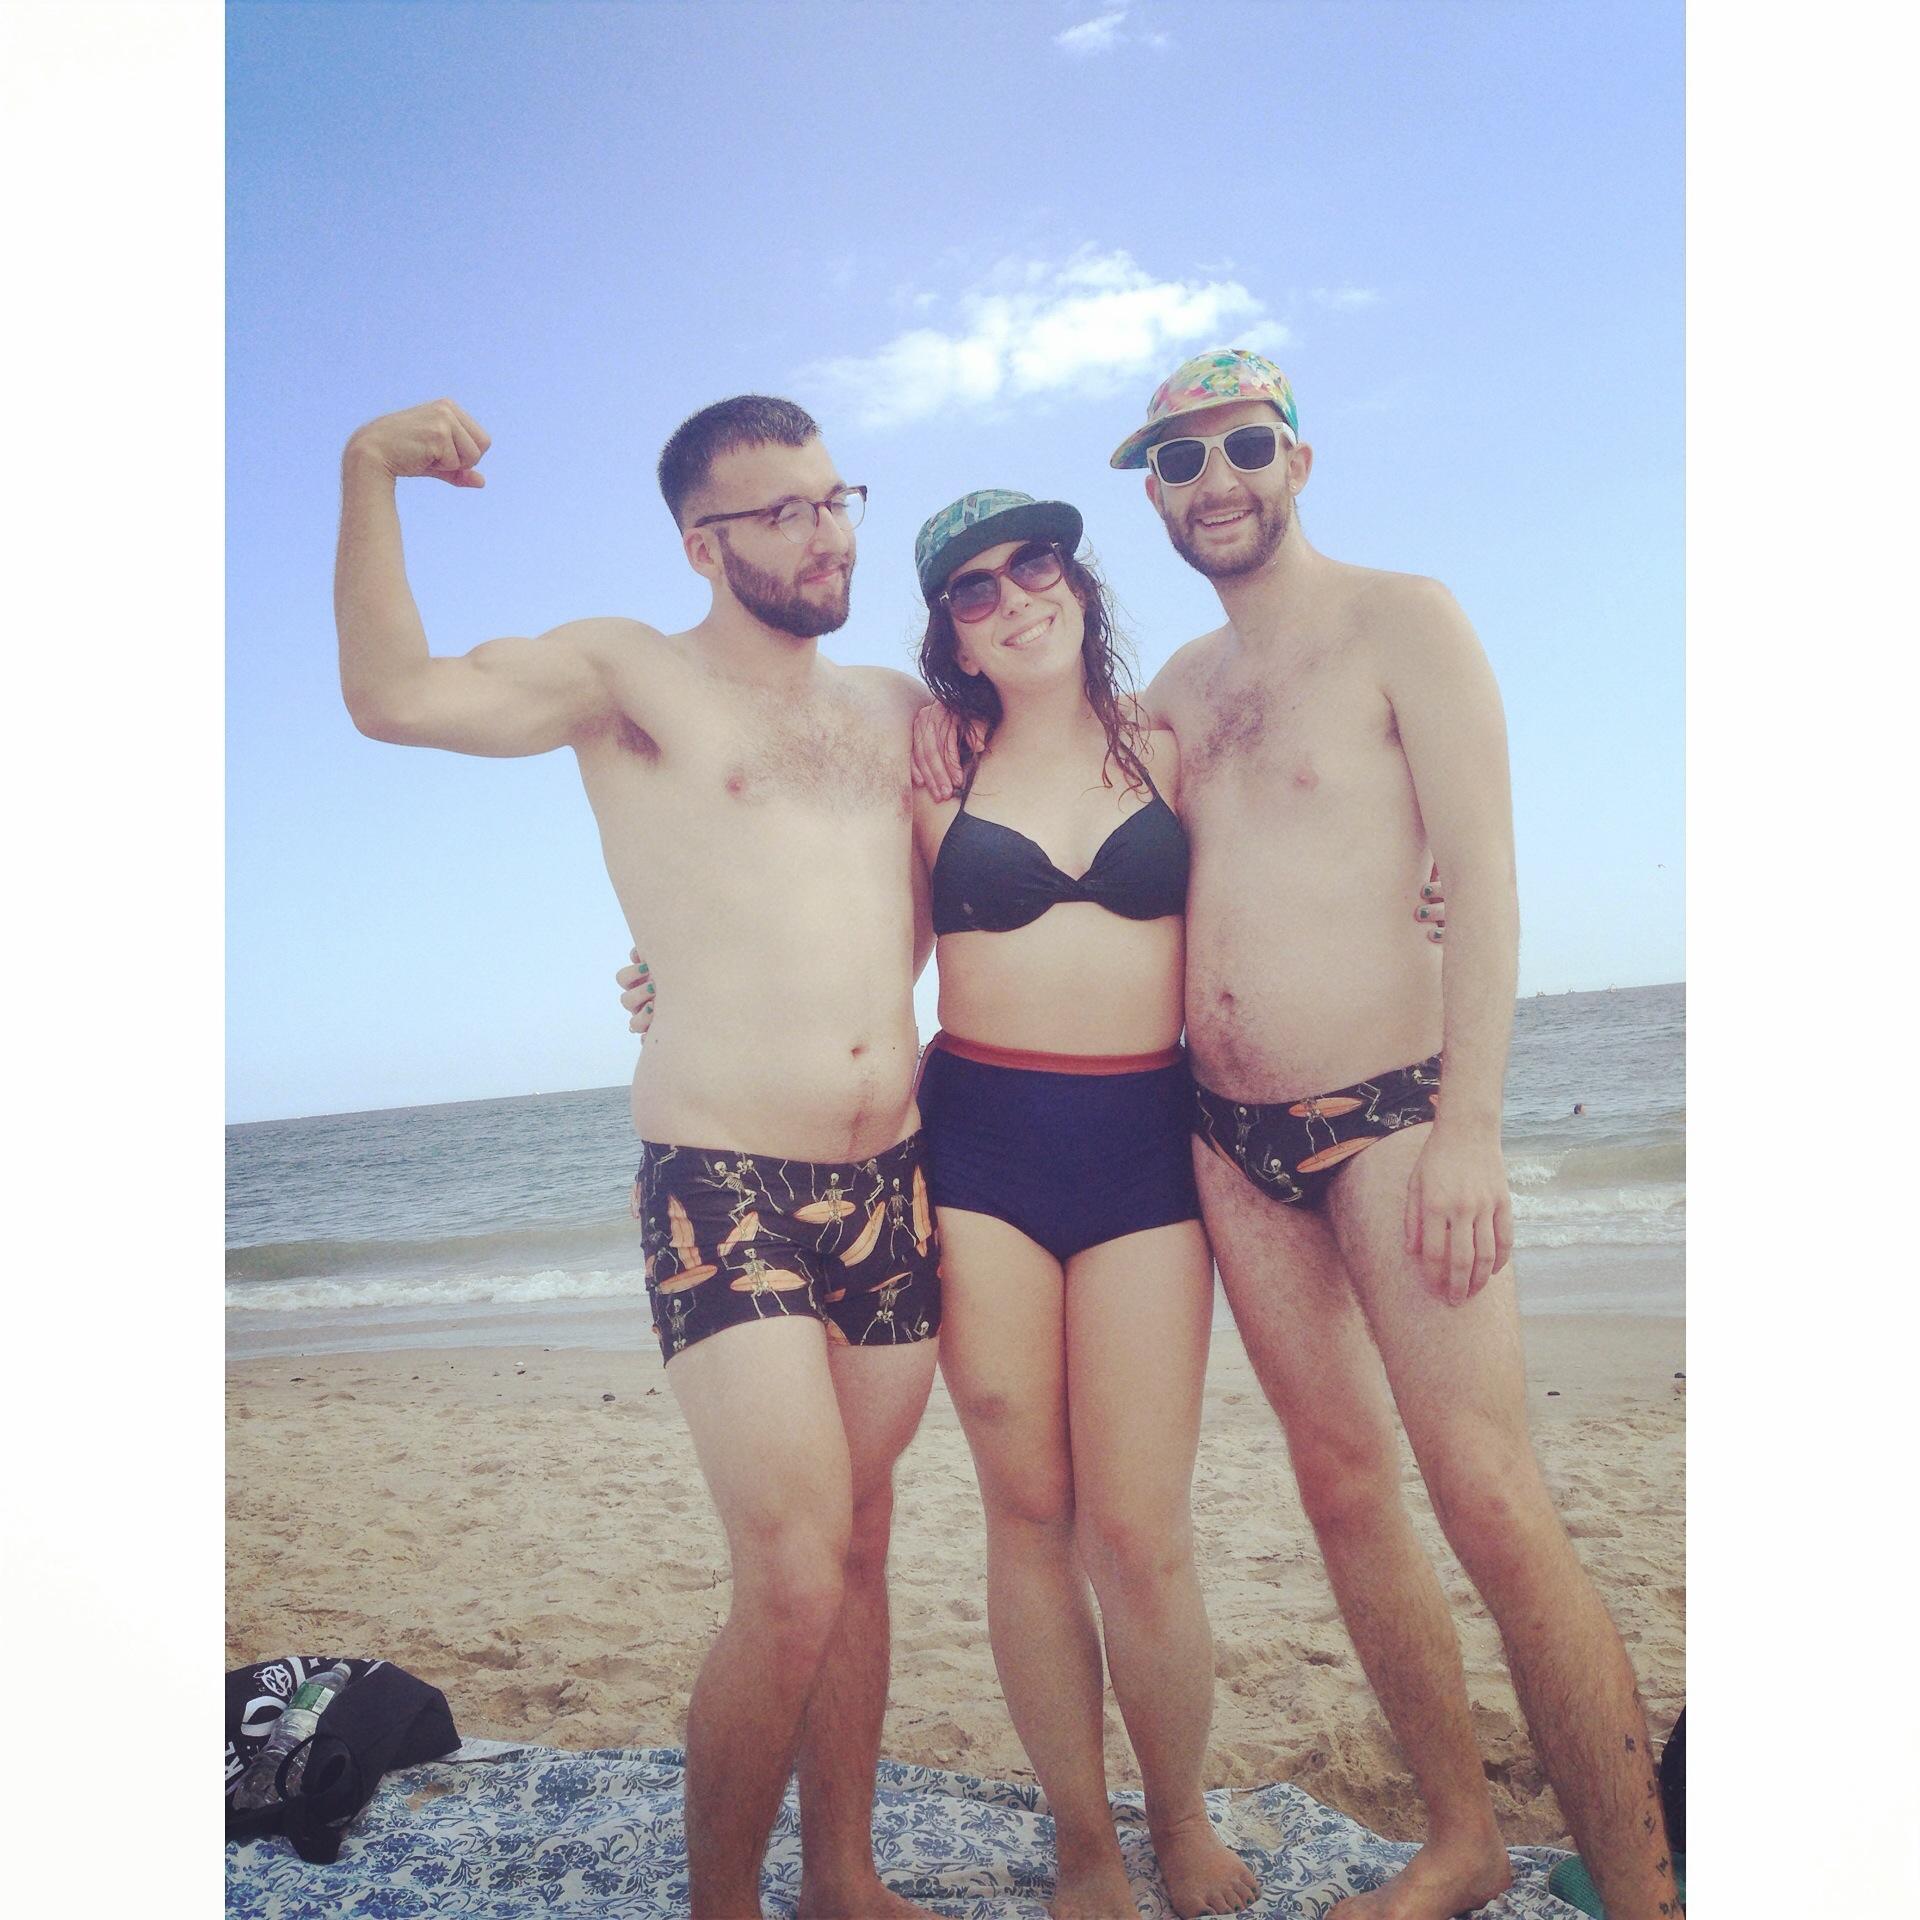 Hang Ten Kill Yourself Trunks, Speedo, and Retro Bikini